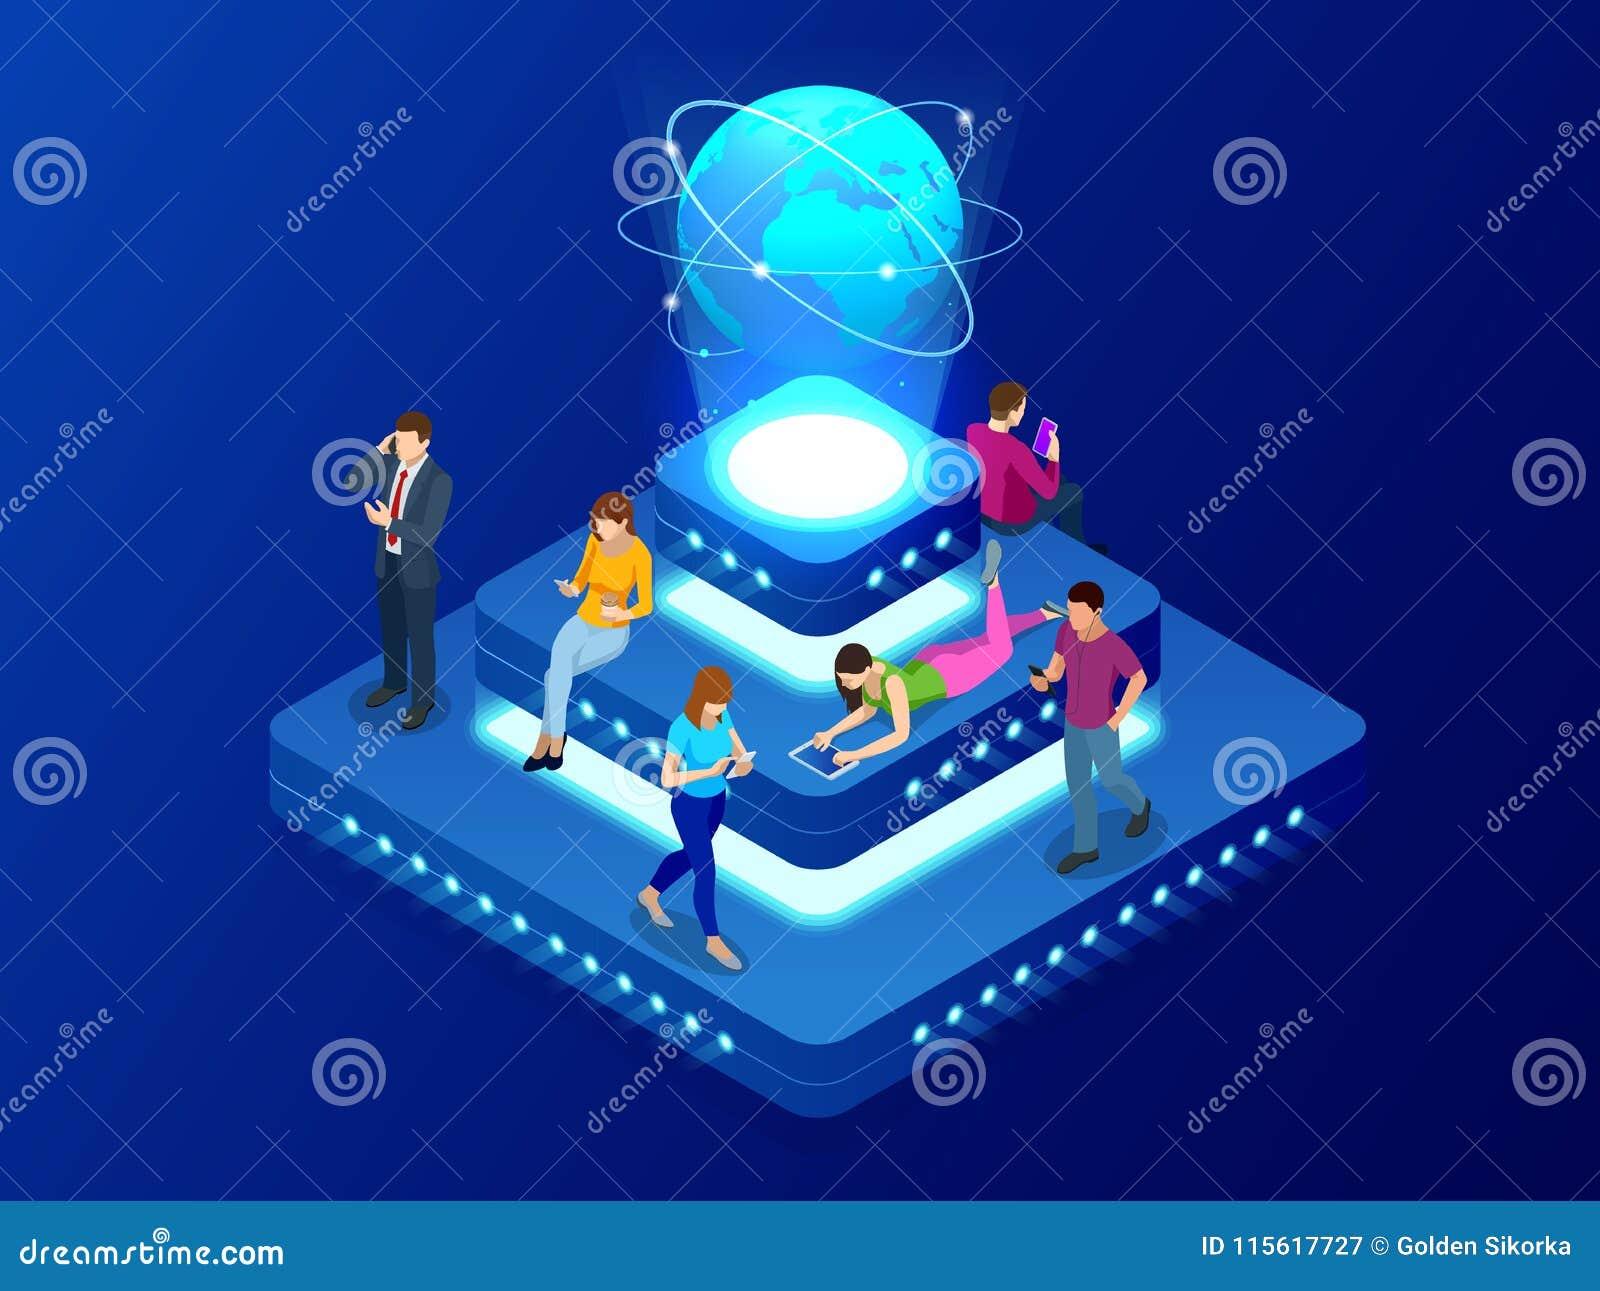 Isometric κοινωνική δίκτυο, τεχνολογία, δικτύωση και έννοια Διαδικτύου Σύνδεση παγκόσμιων δικτύων, σφαιρικές ανταλλαγές datas